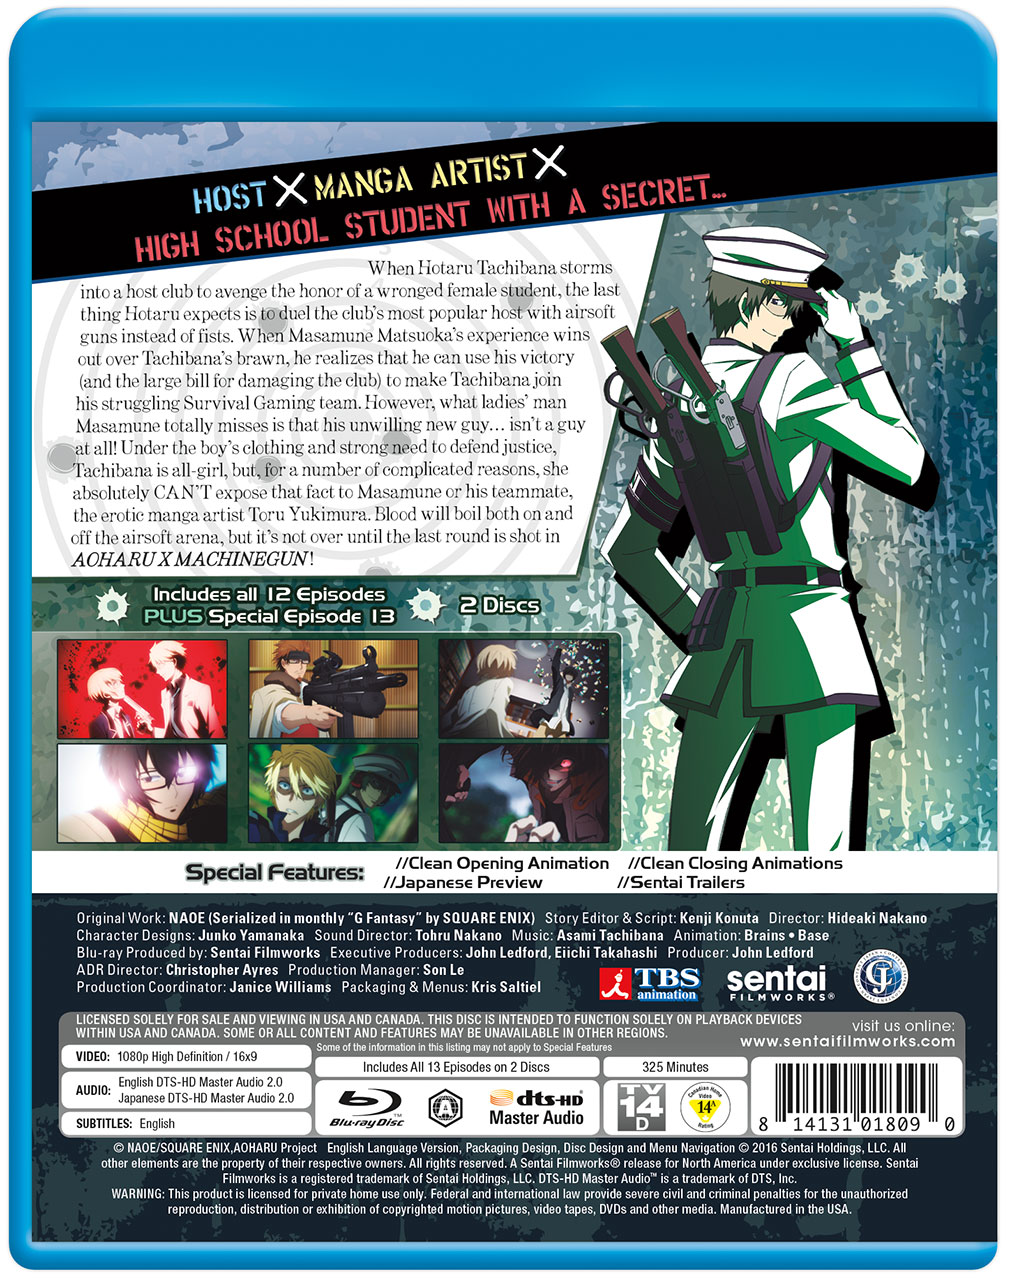 Aoharu x Machinegun Blu-ray